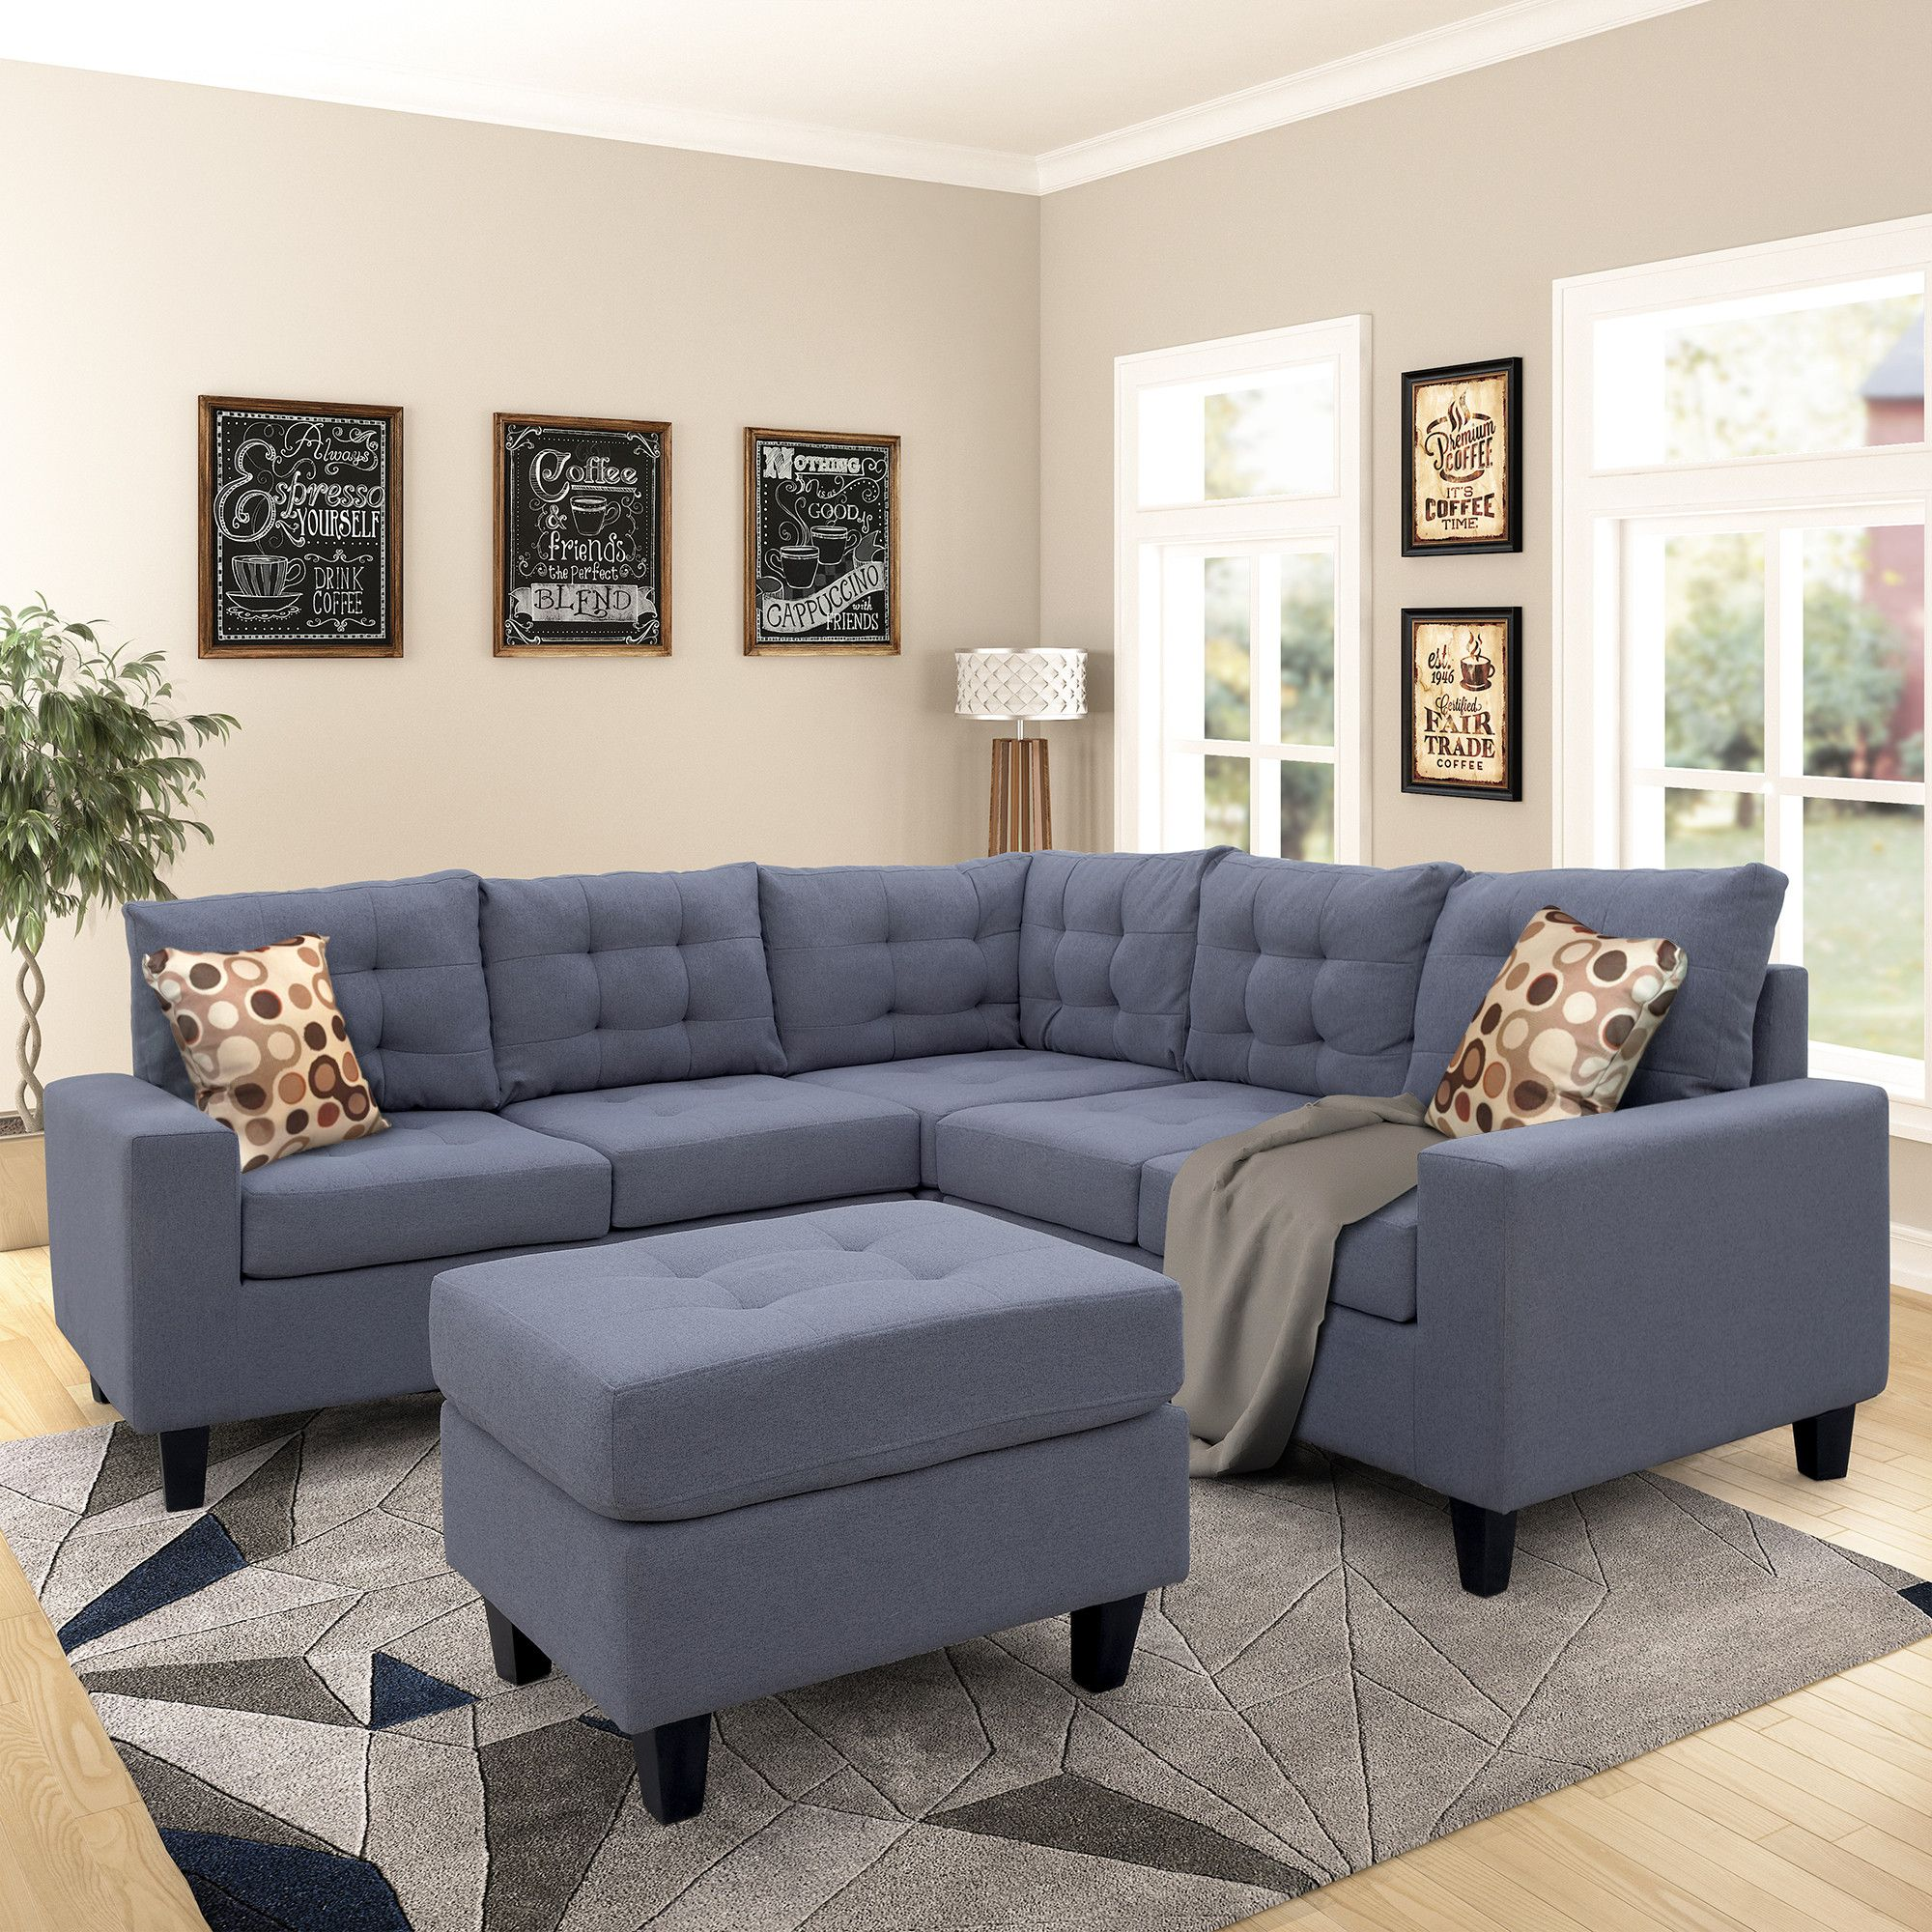 symmetrical sectioanl sofa with ottoman